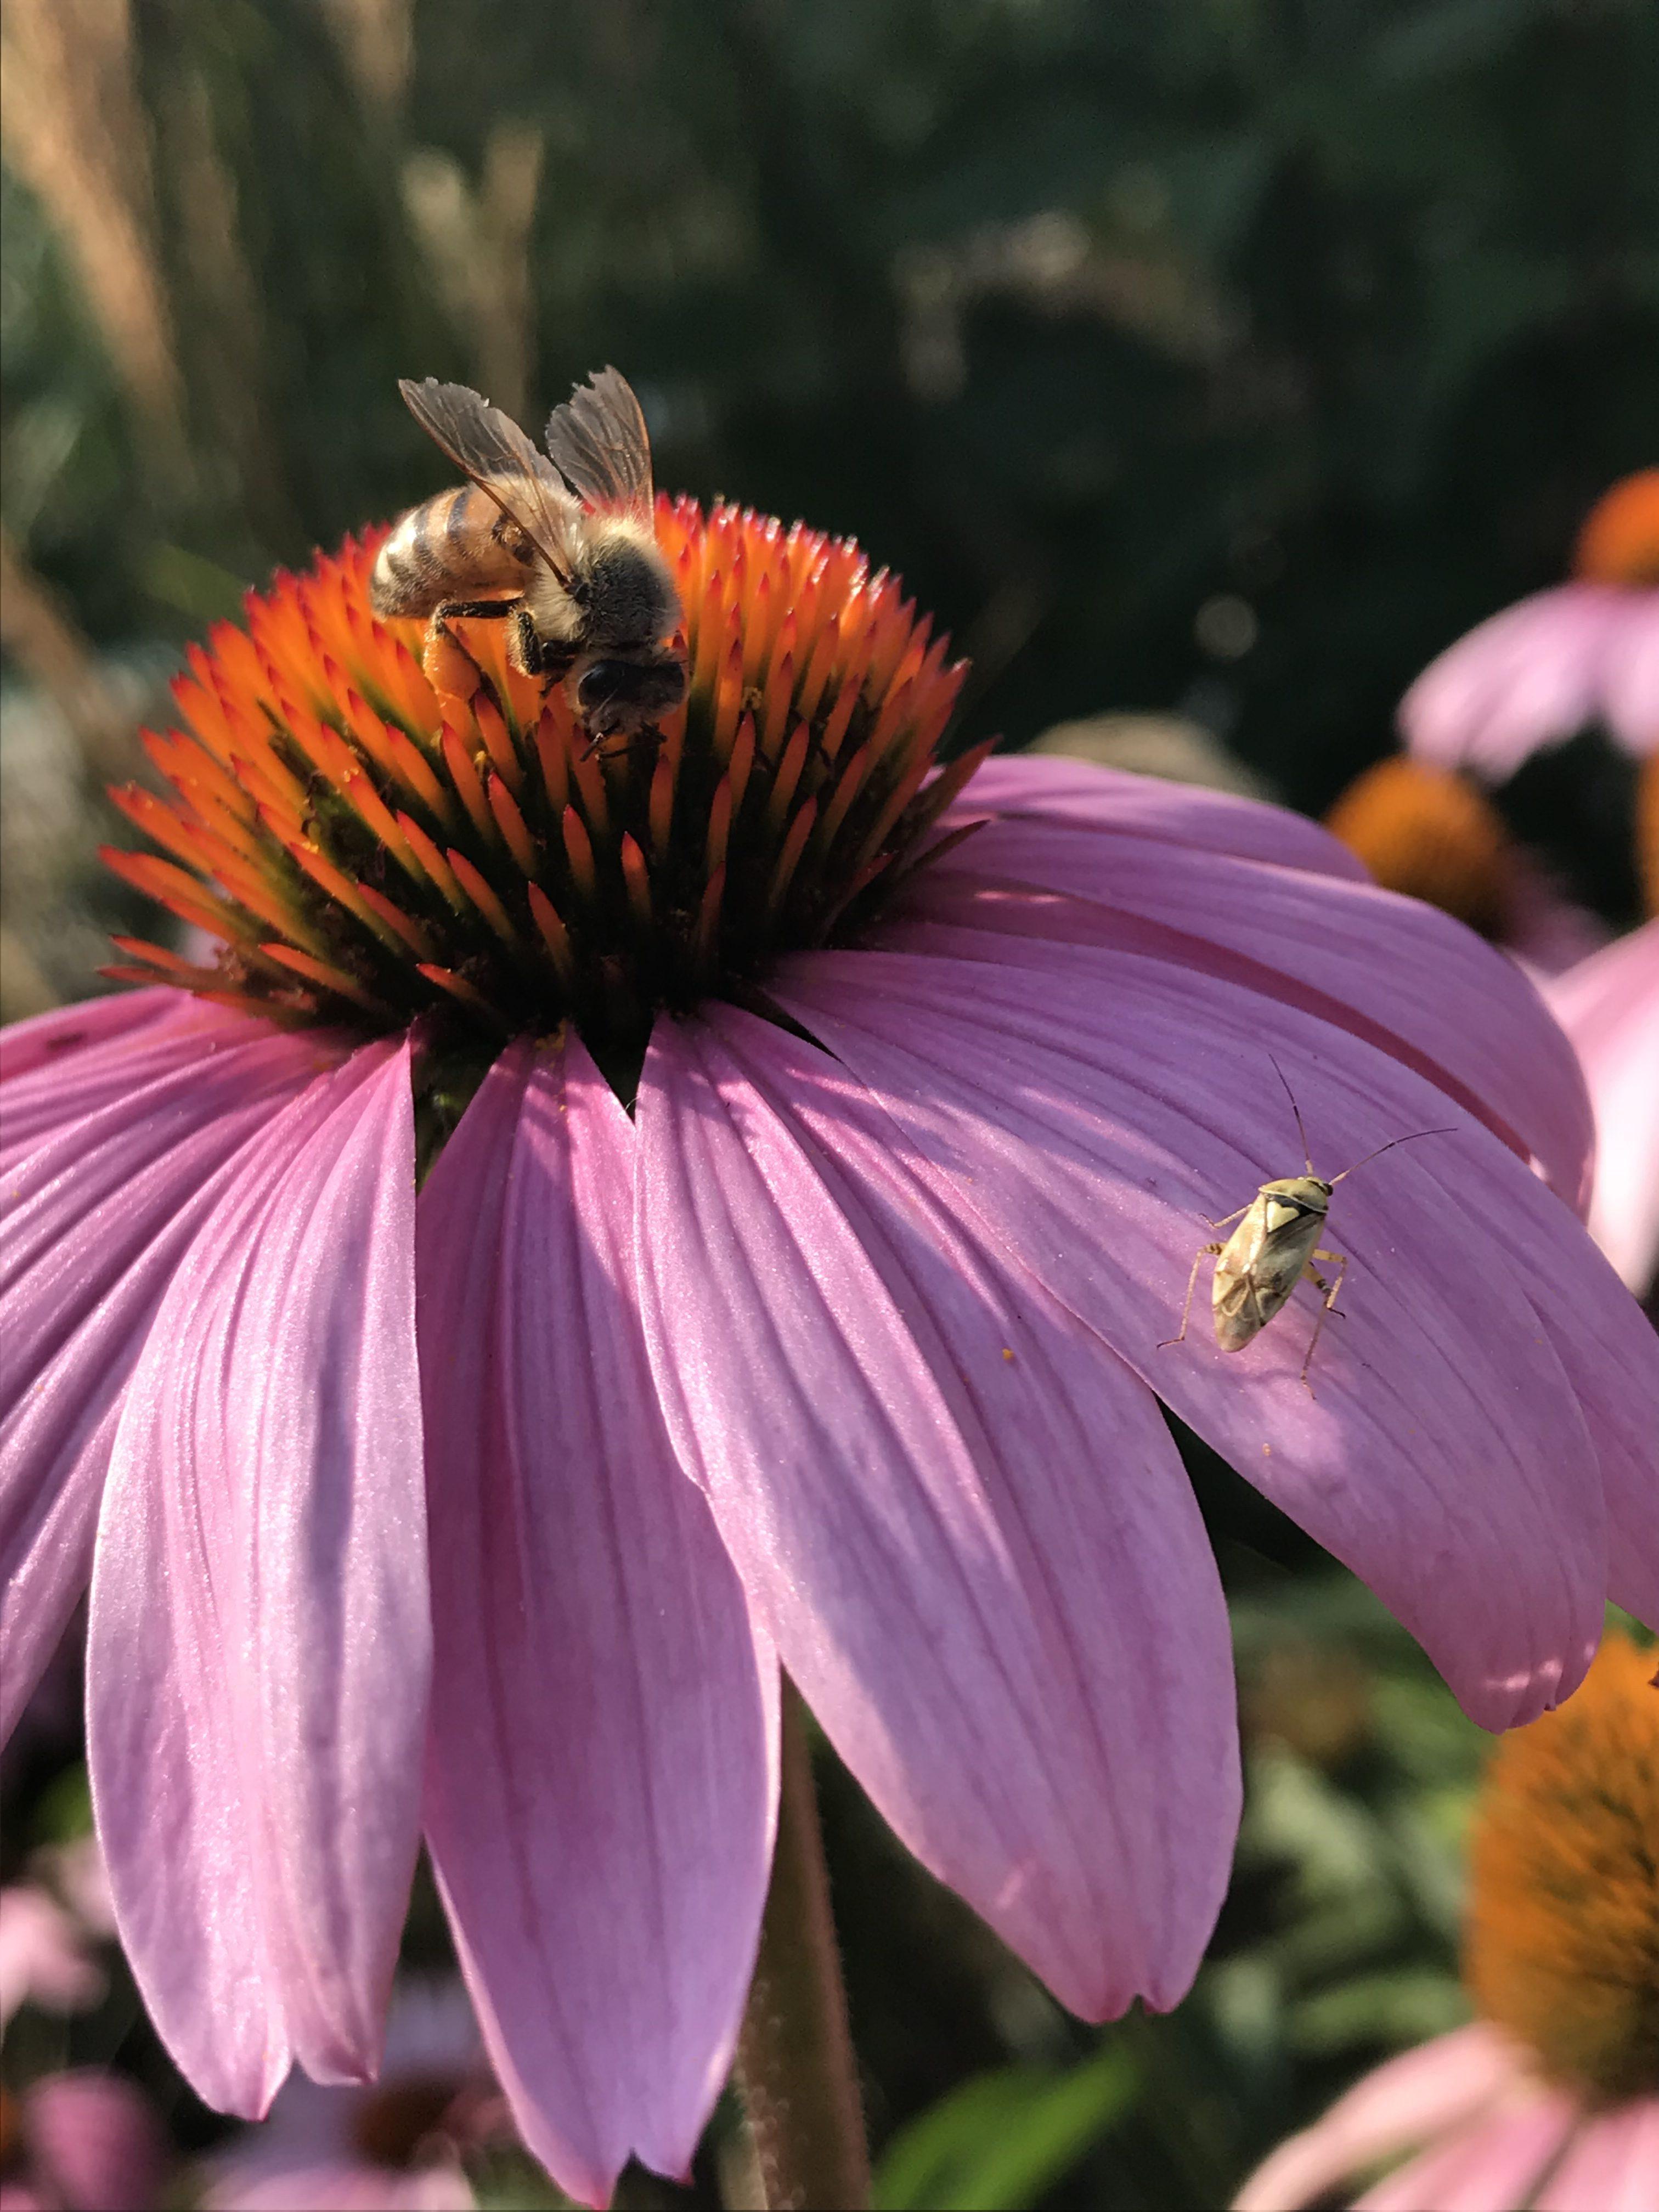 Garten Blume & Biene